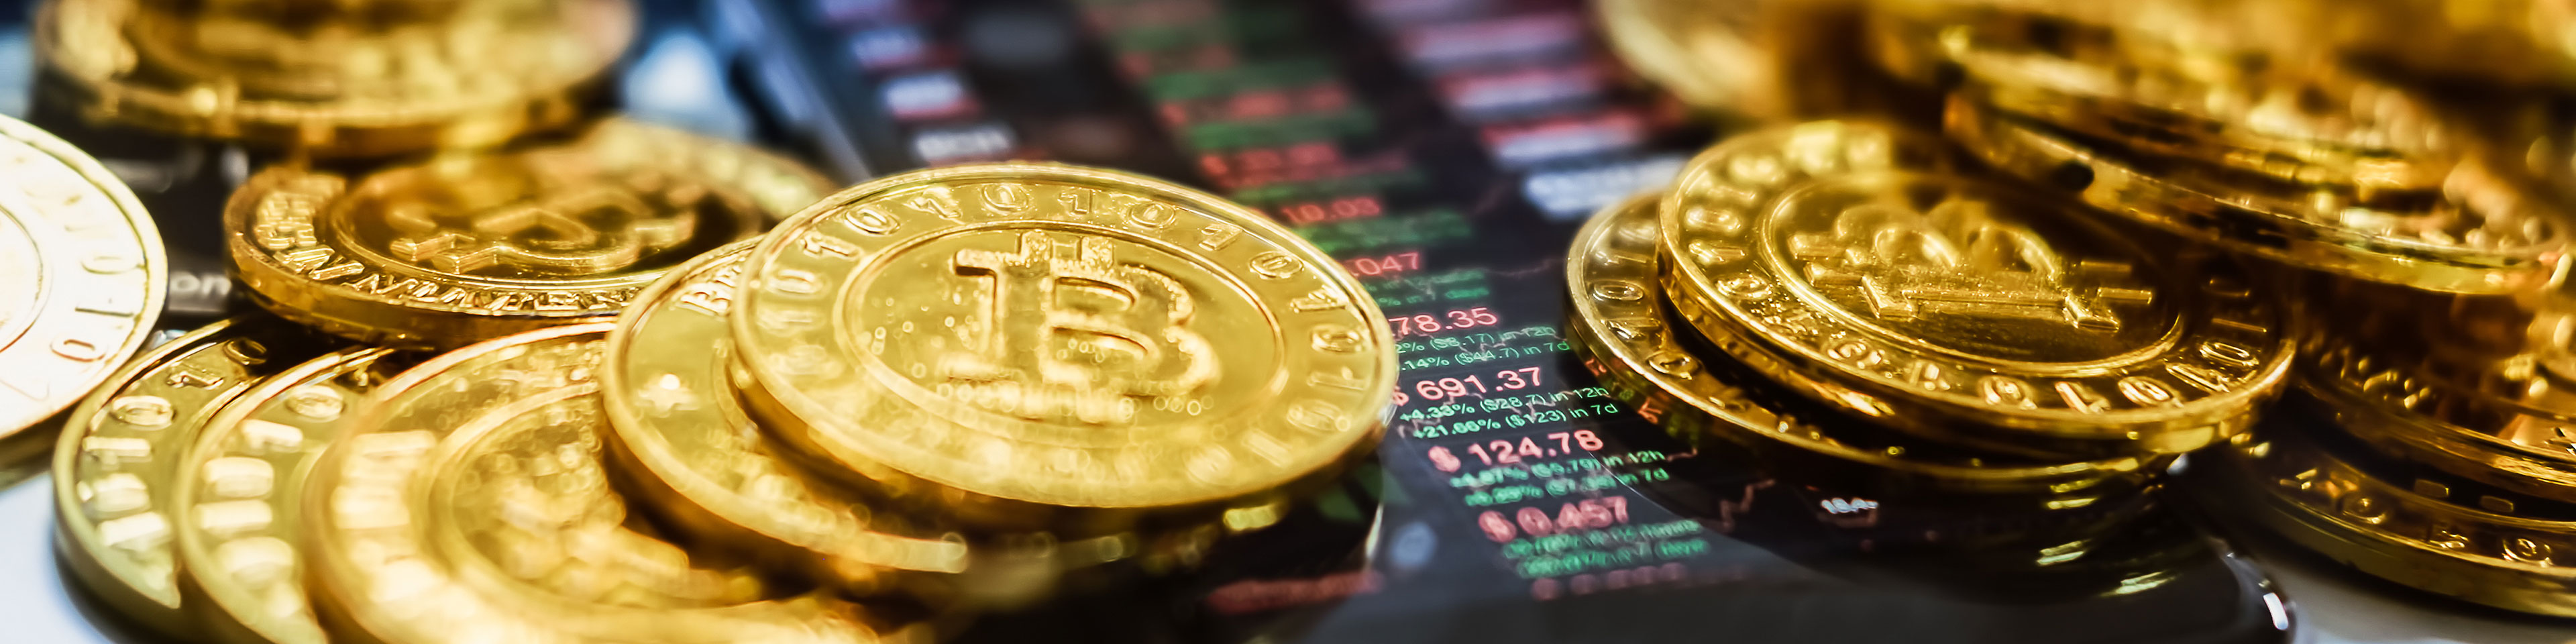 OCC okays custody services for cryptocurrencies